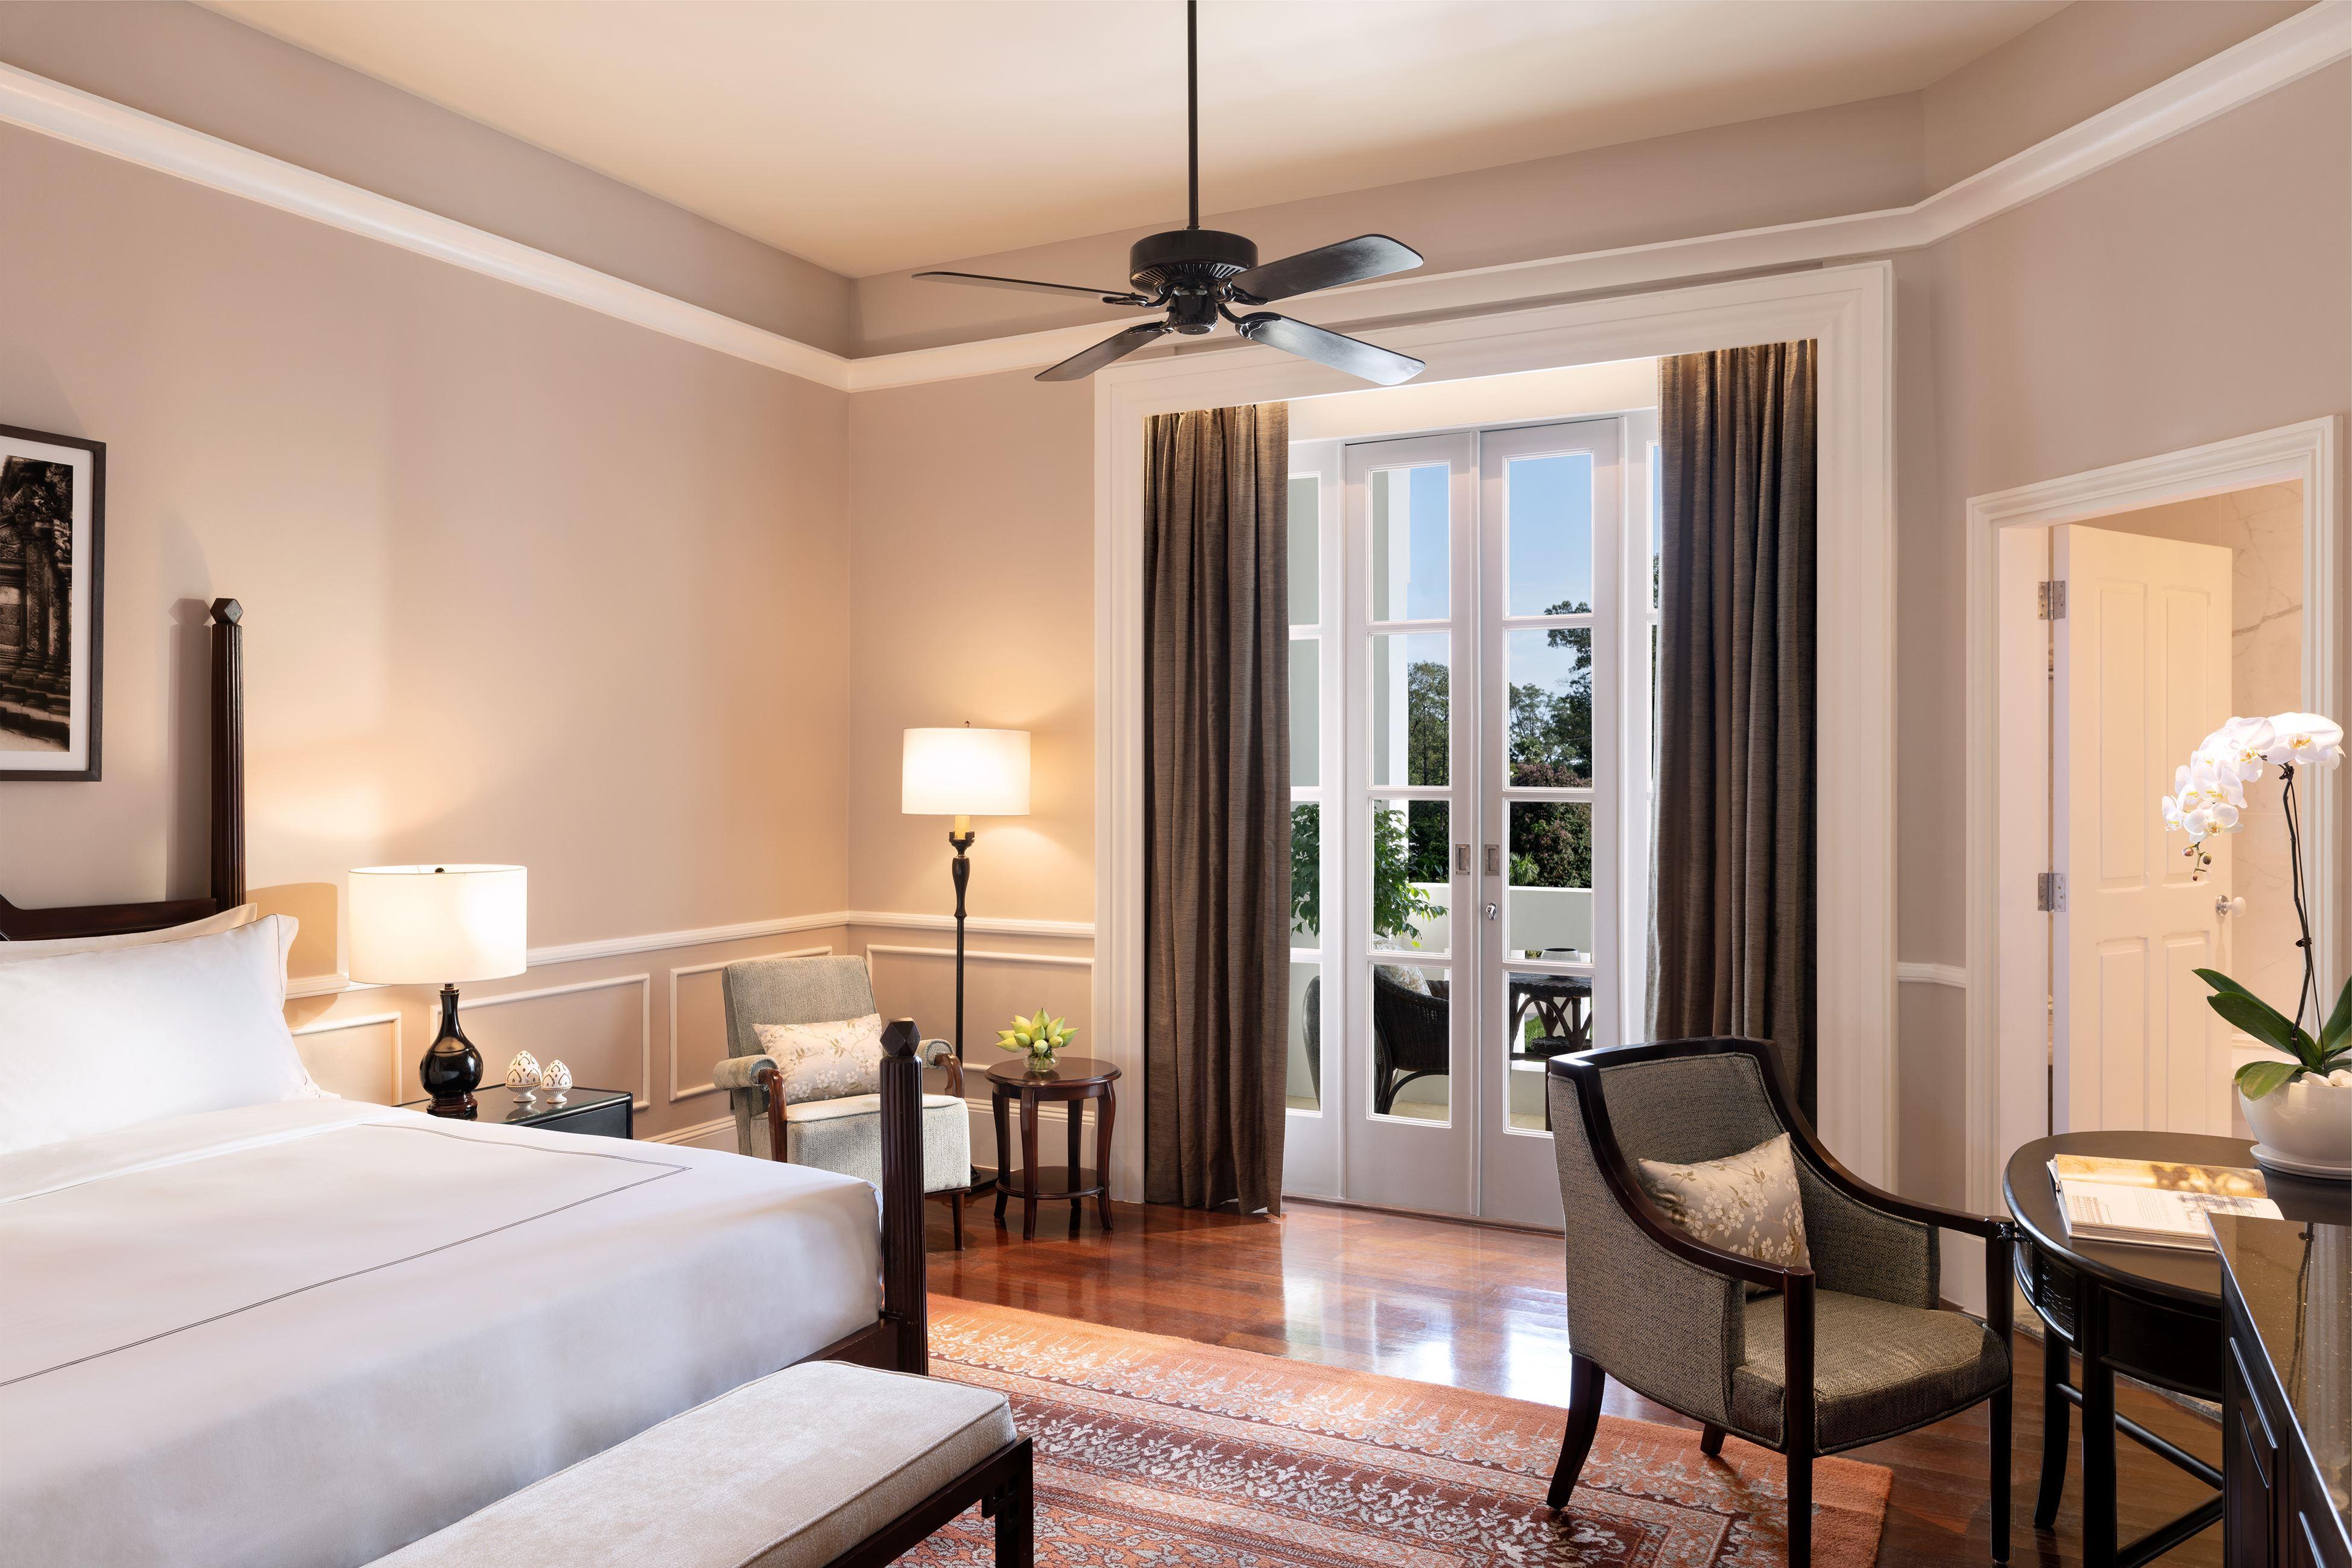 Raffles_Landmark Room King